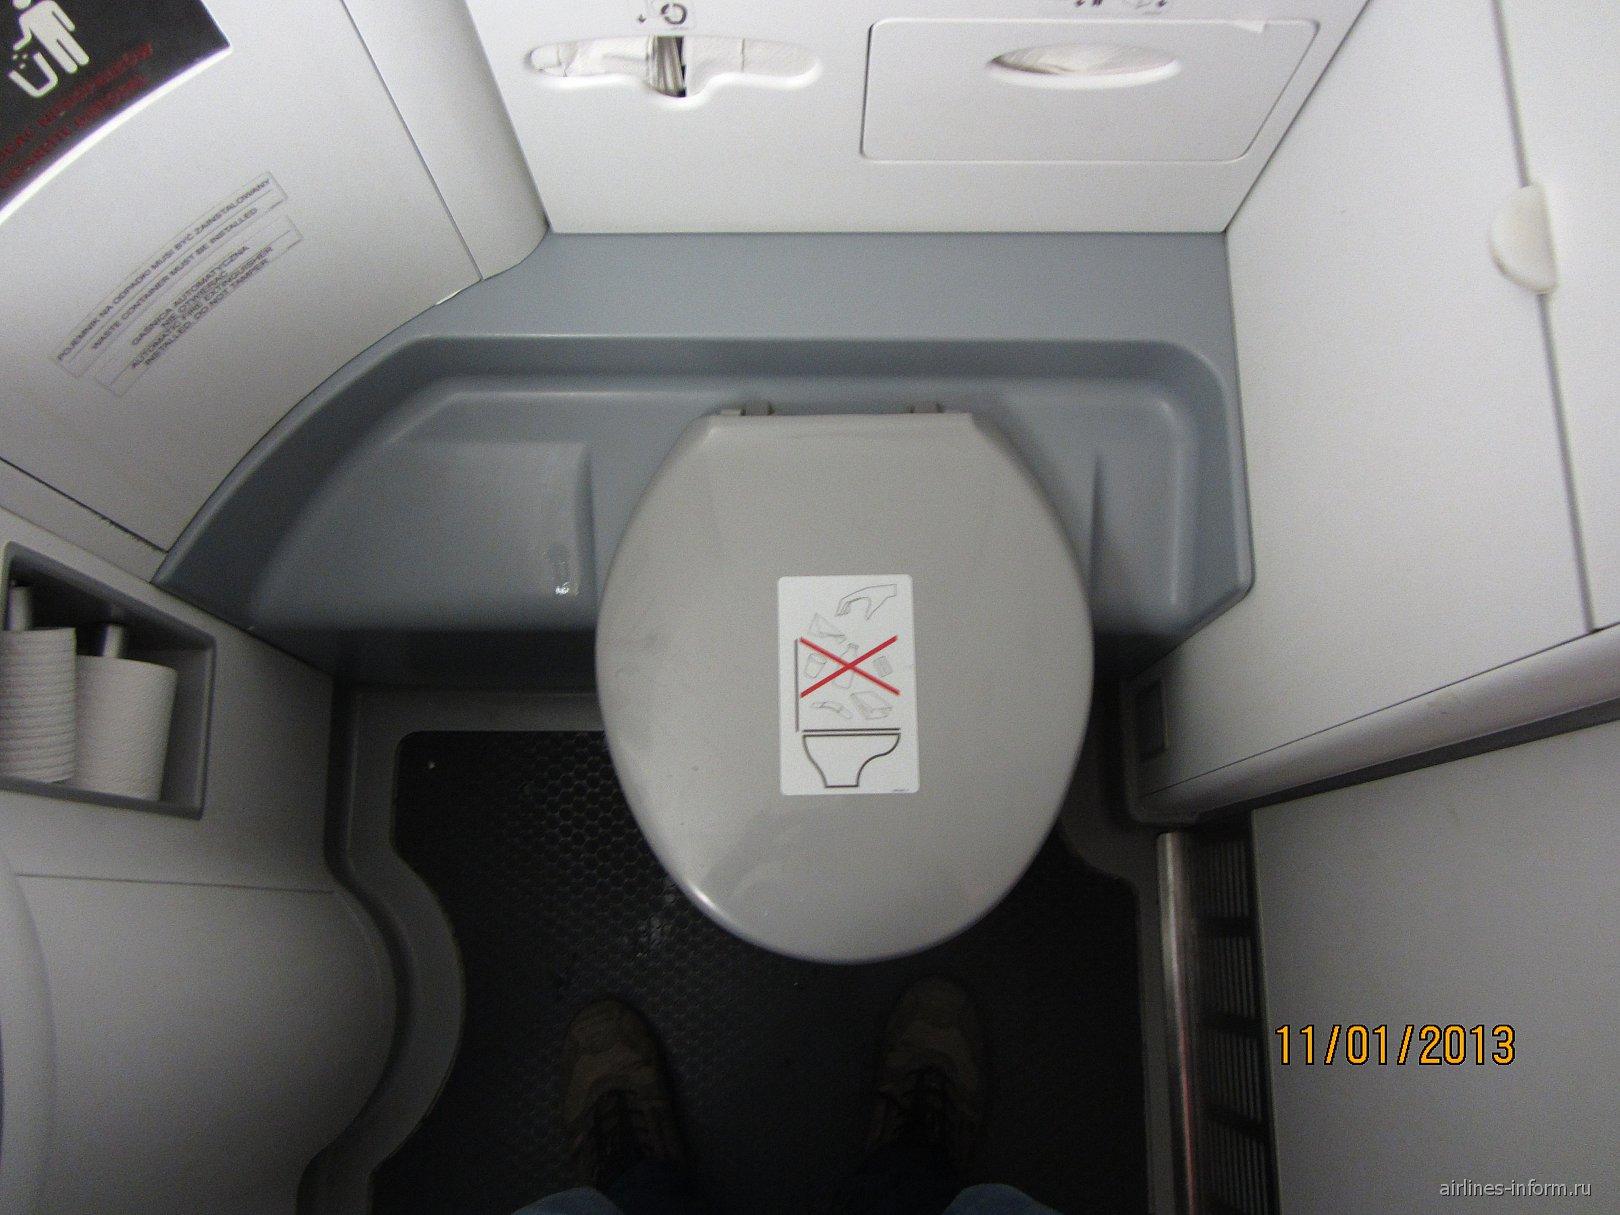 Туалет самолета Embraer 175 авиакомпании LOT